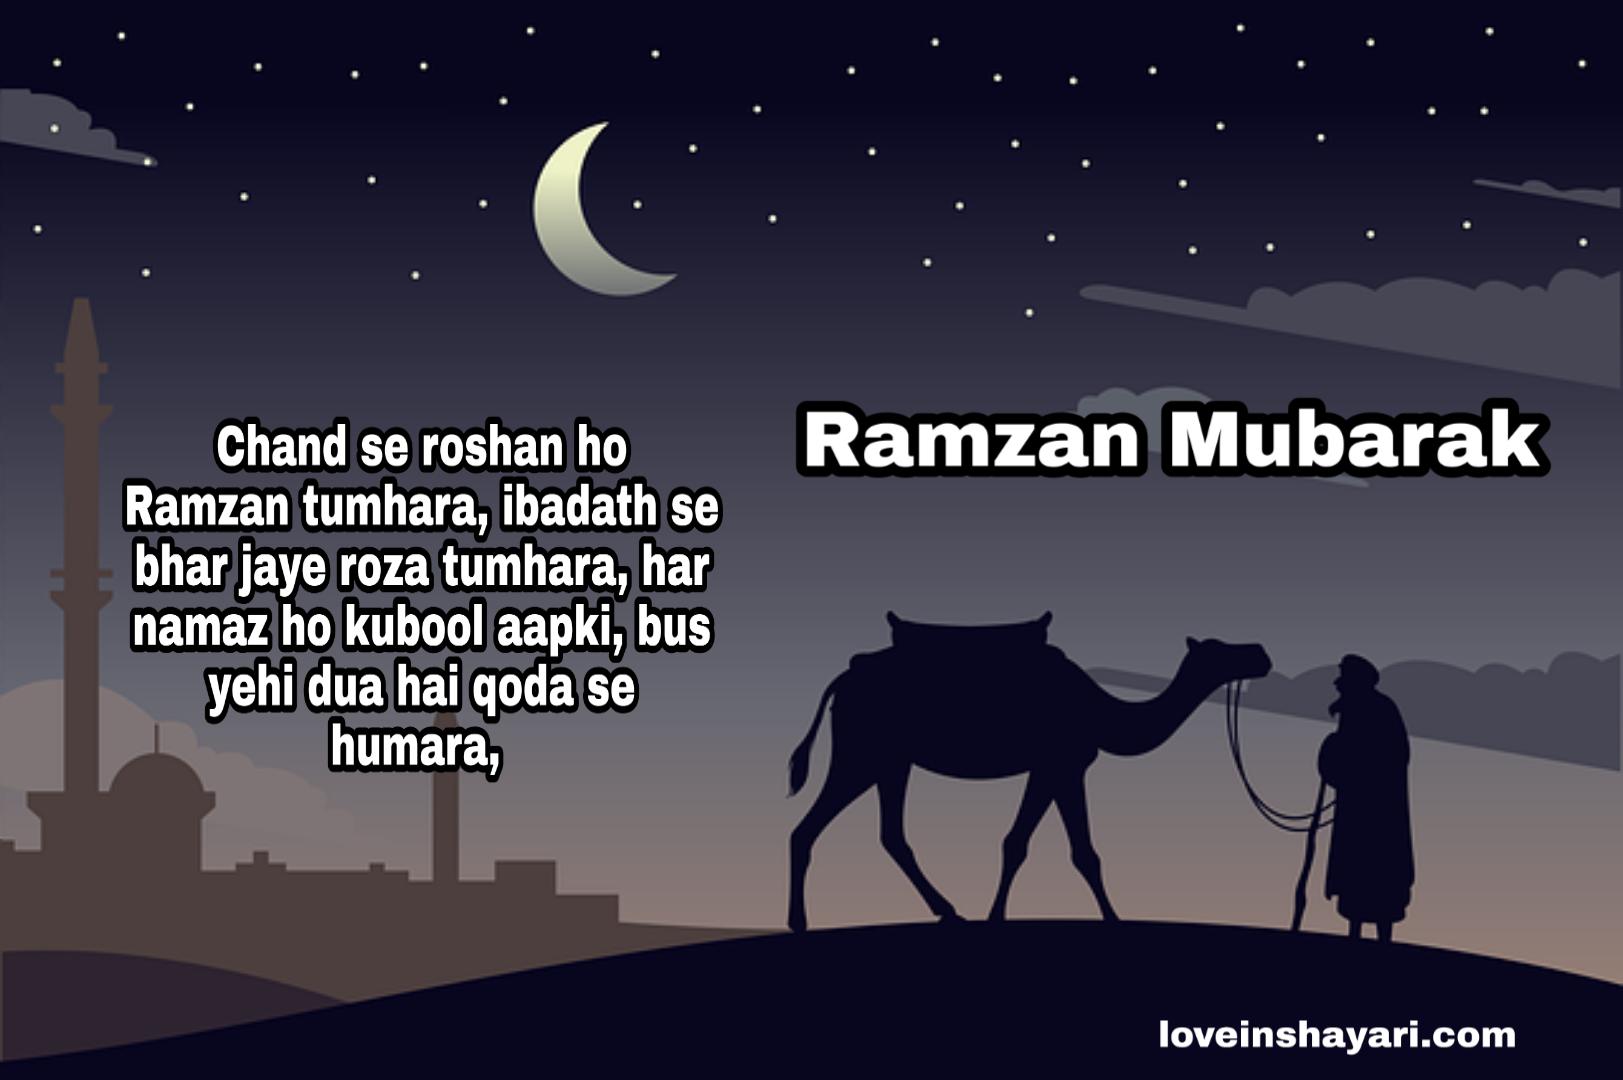 Ramzan images